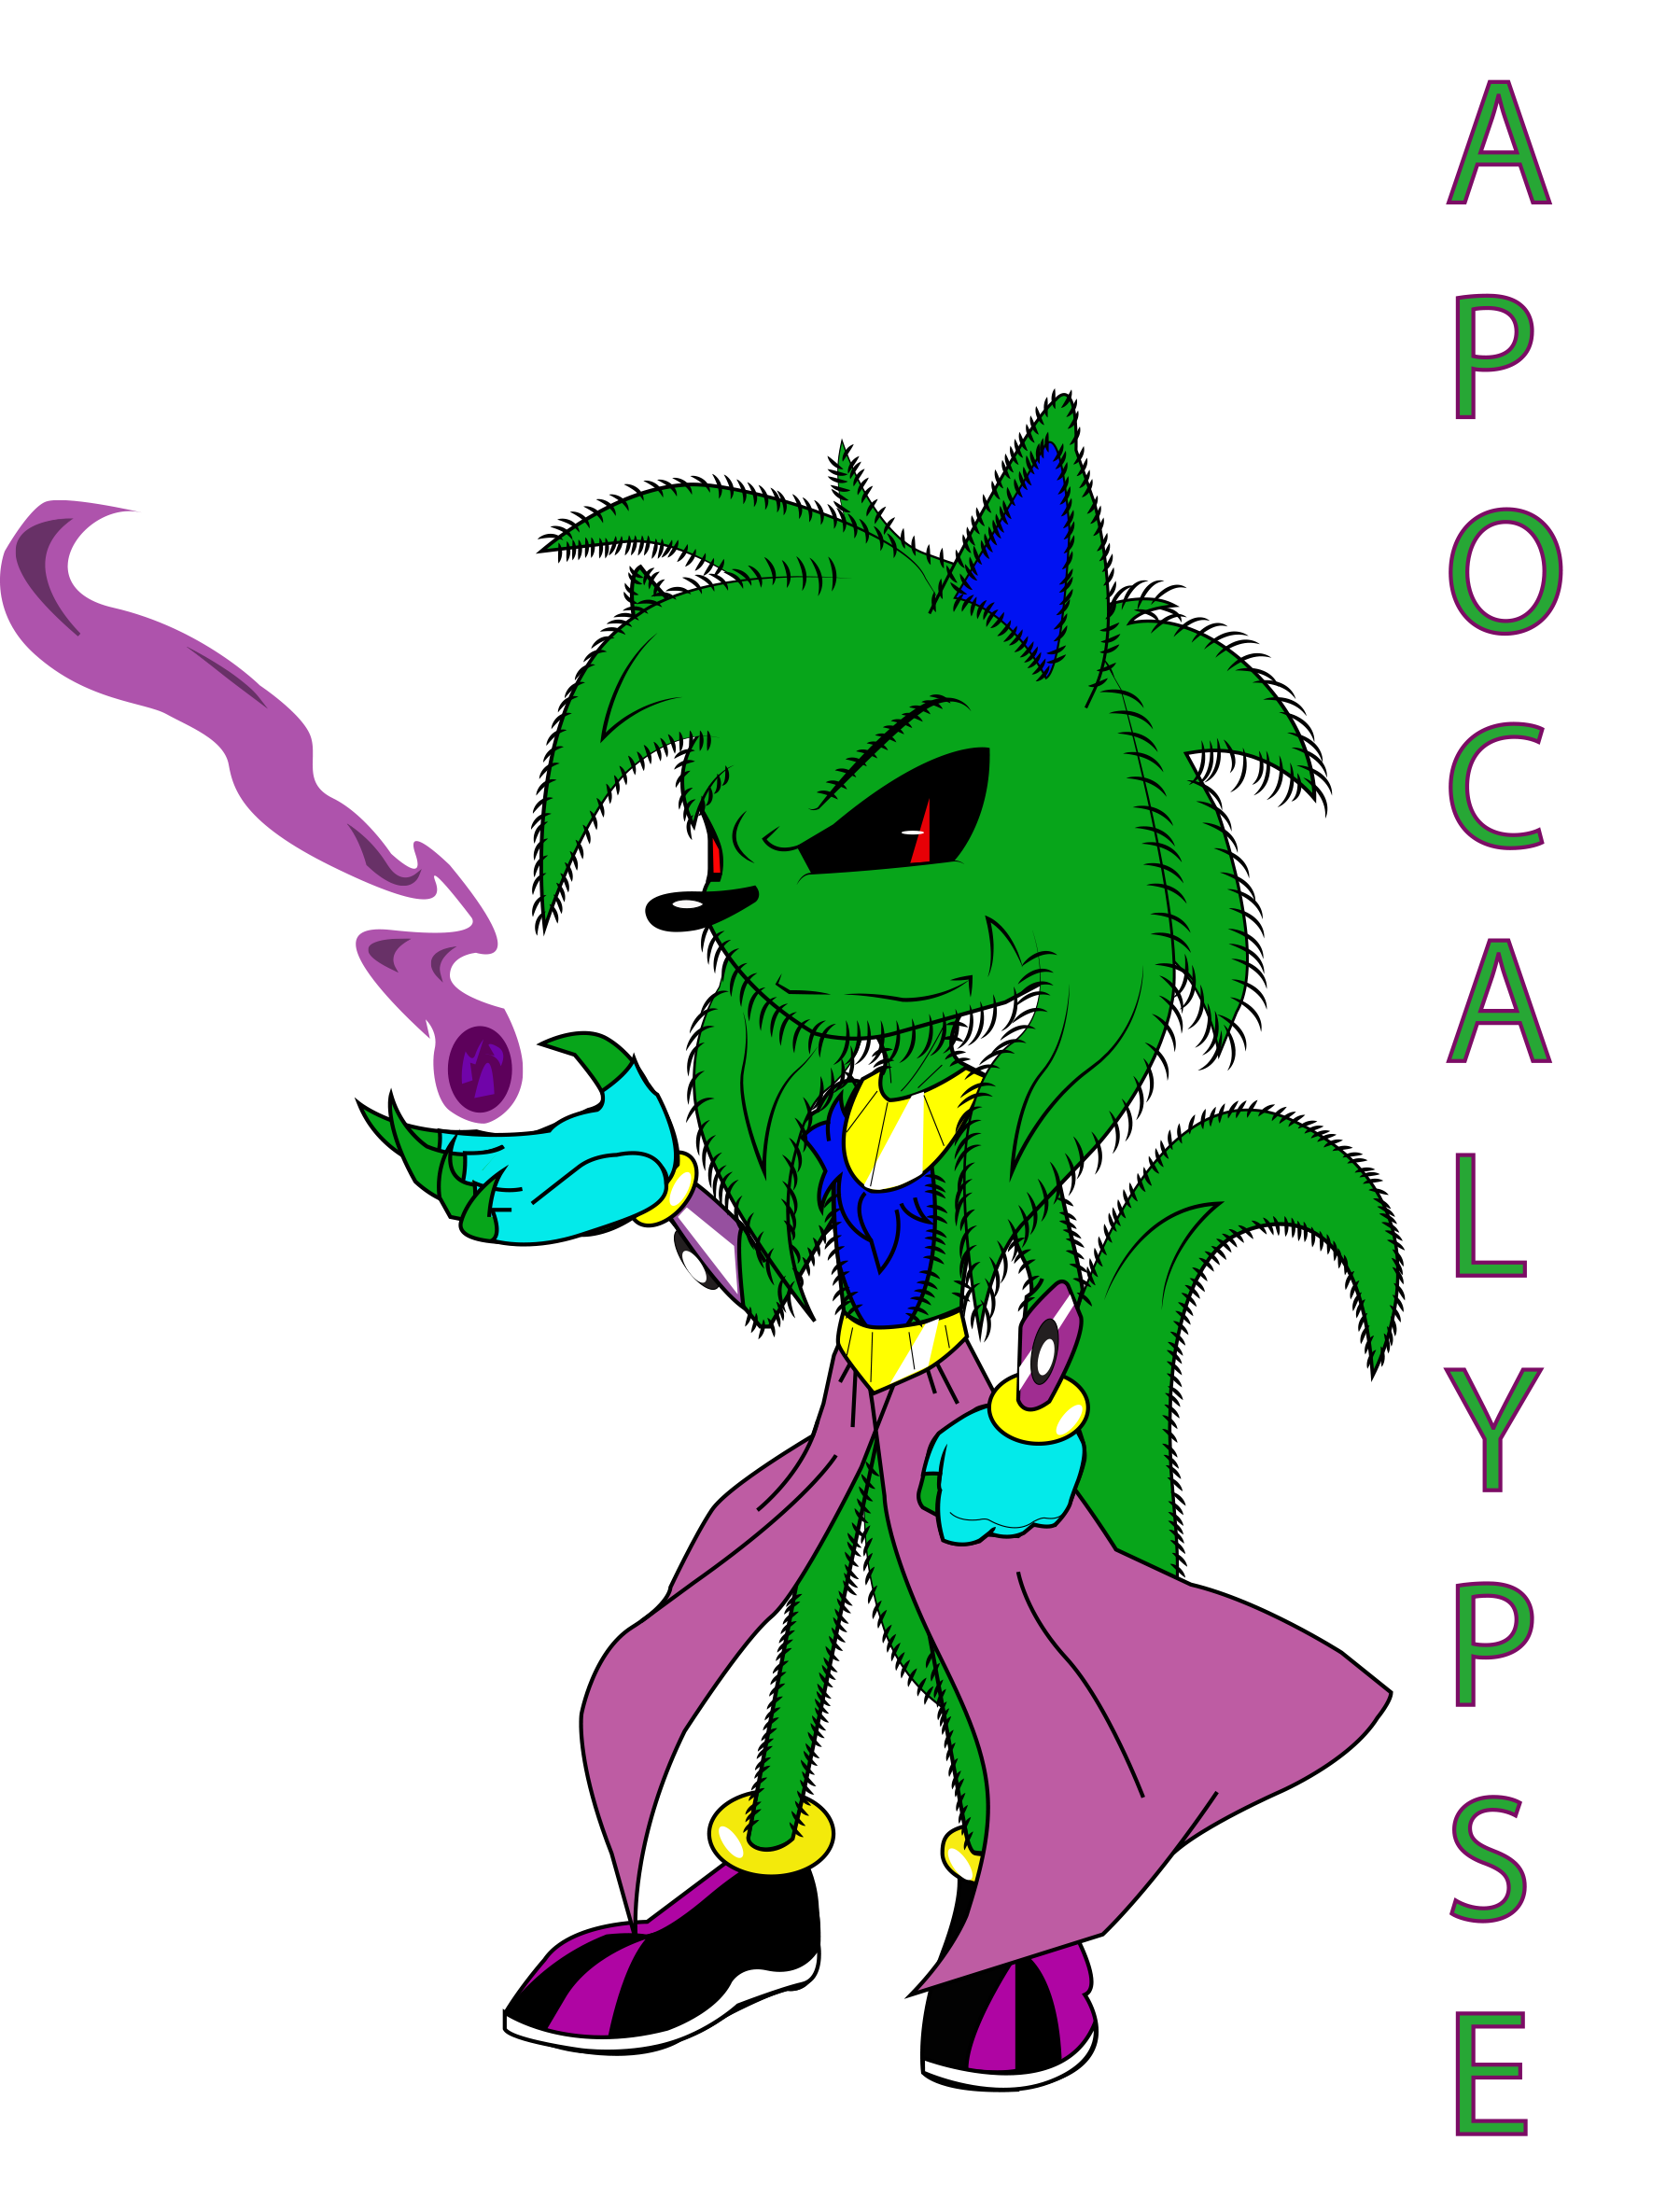 Apocalypse the Demonhog